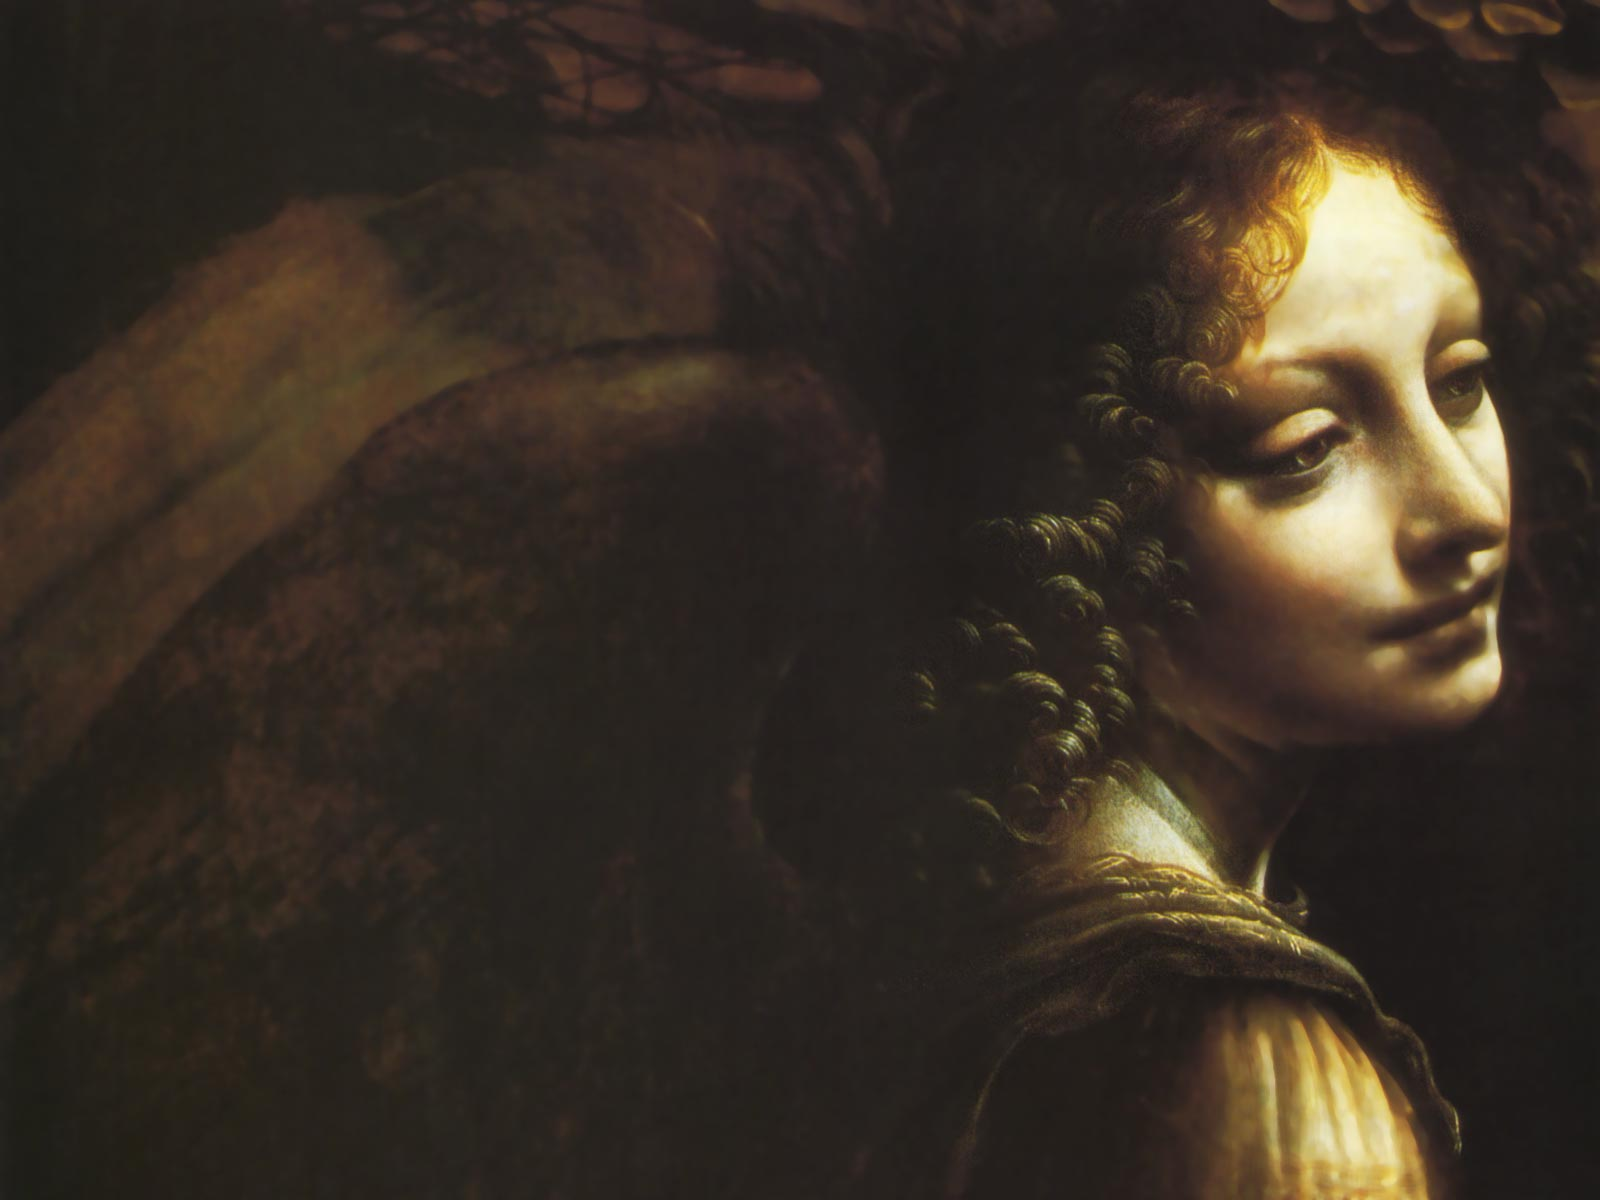 Leonardo Da Vinci - The Virgin of the Rocks